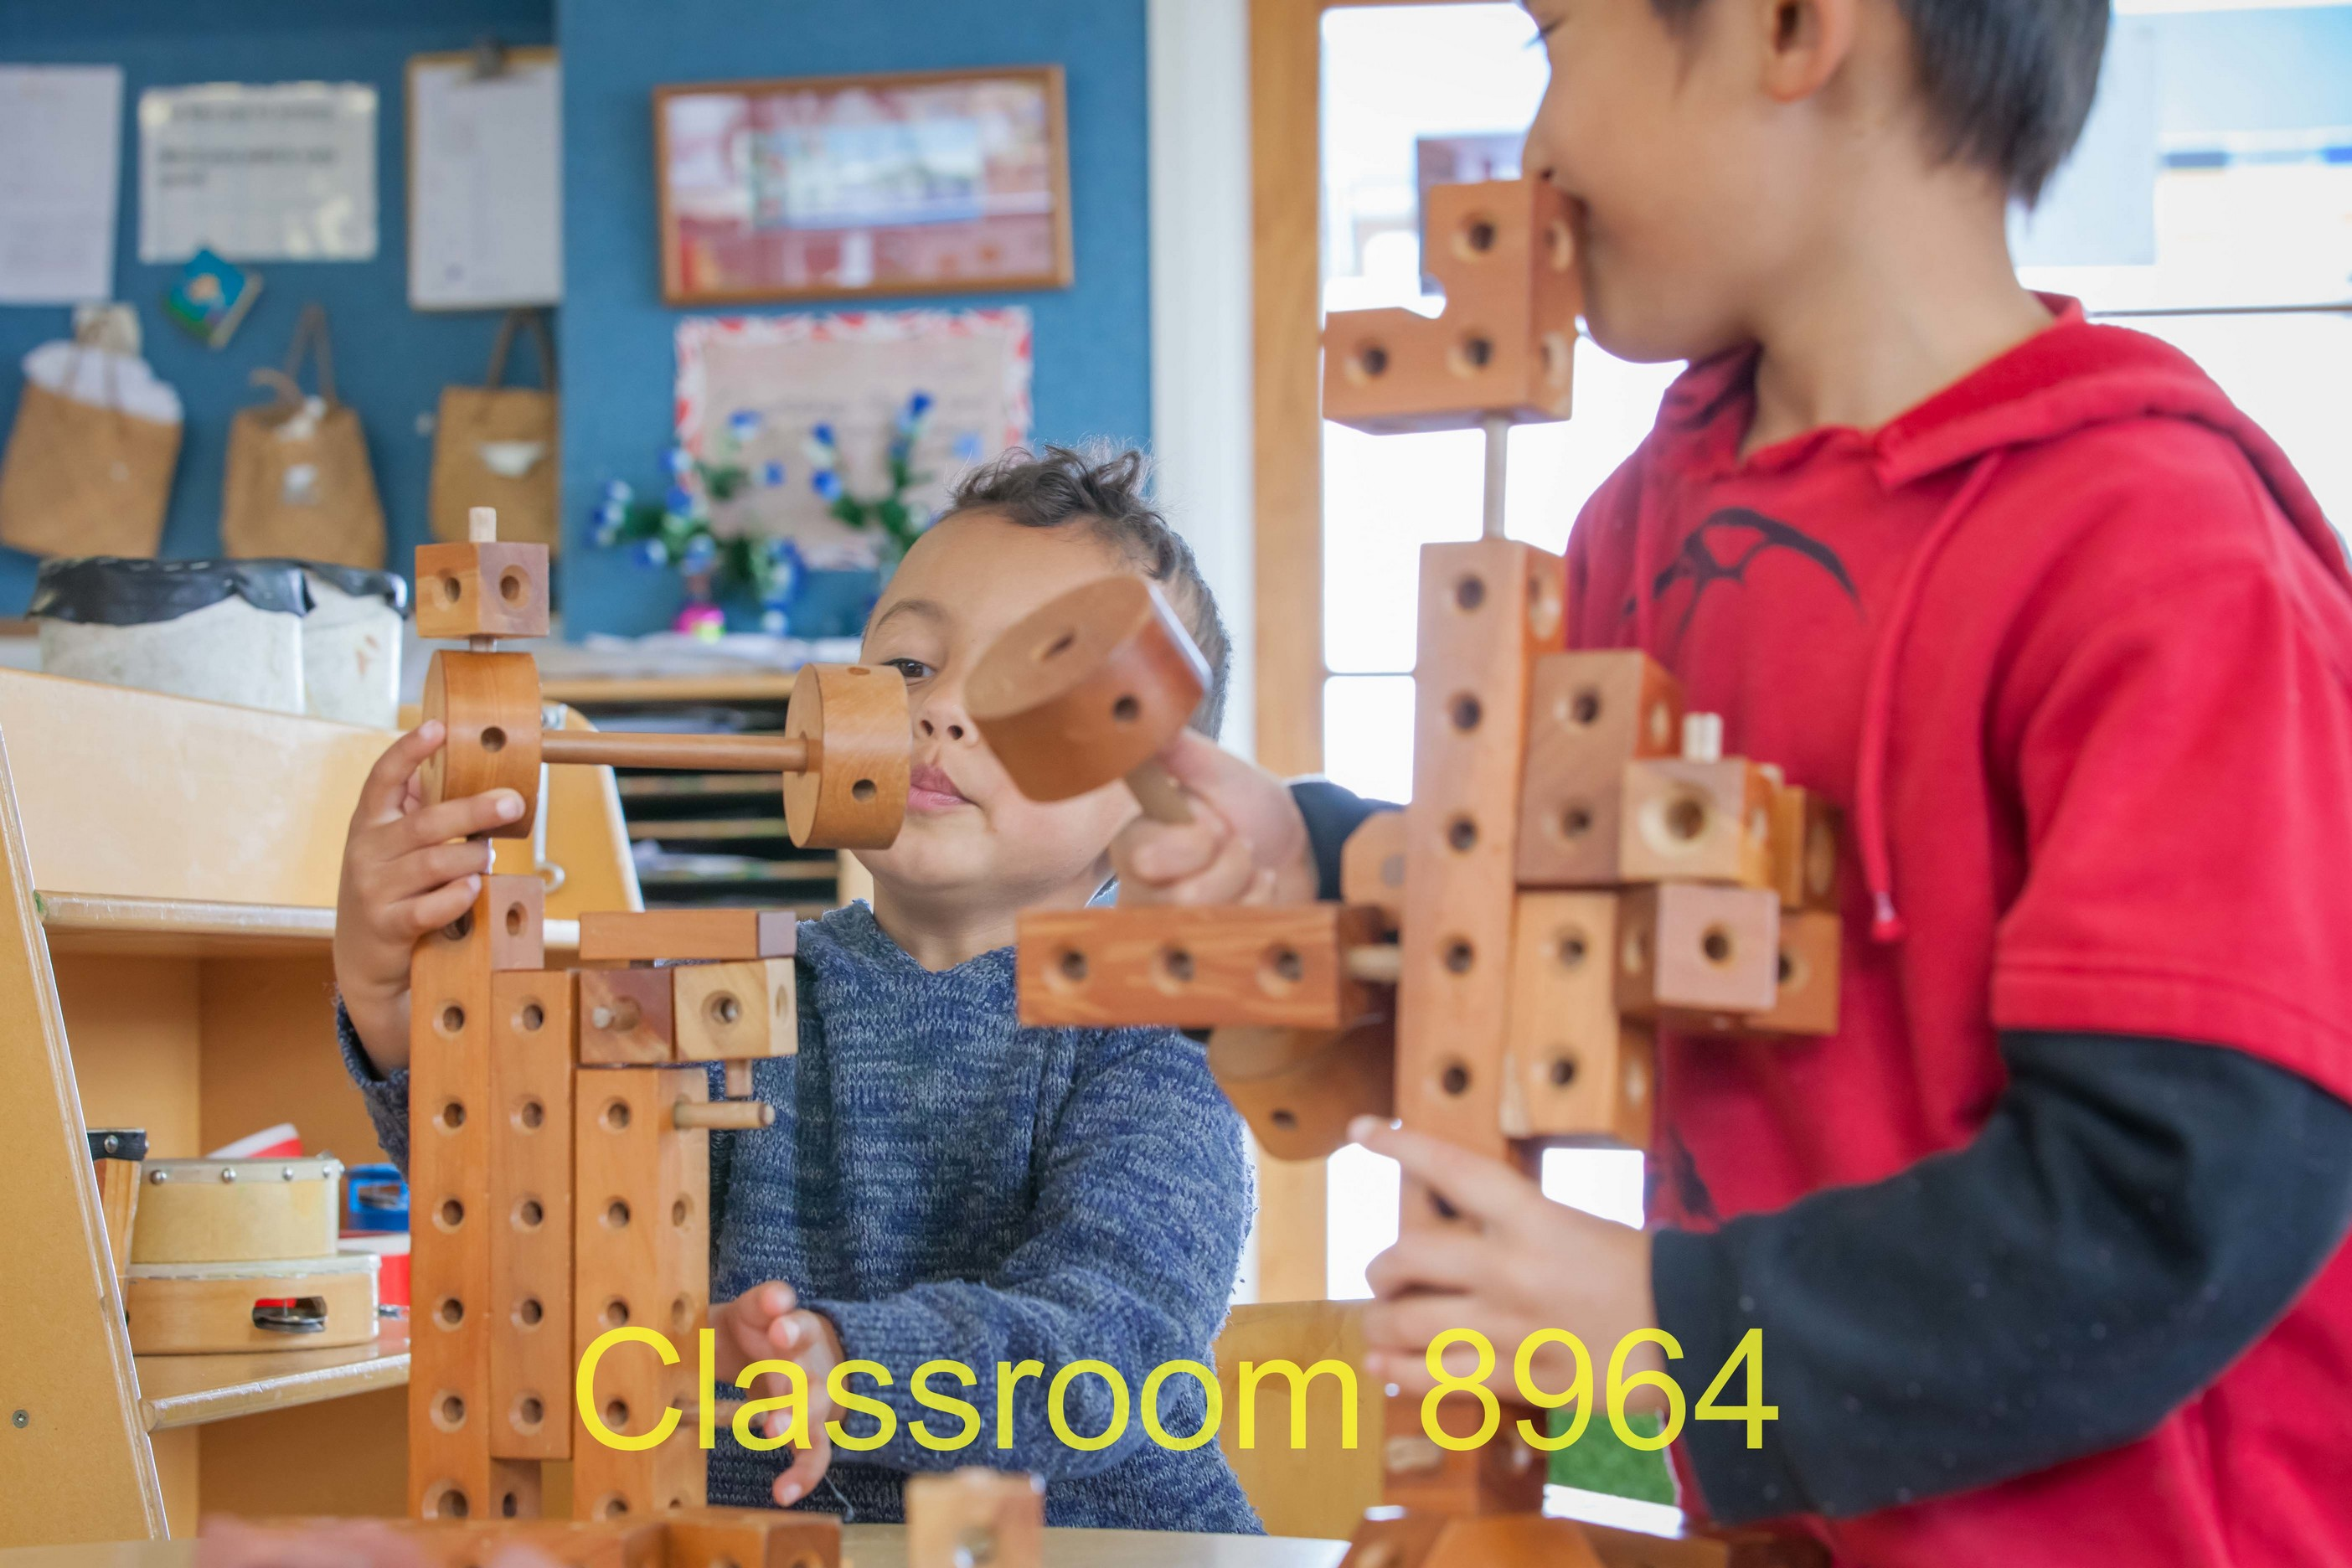 Classroom 8964